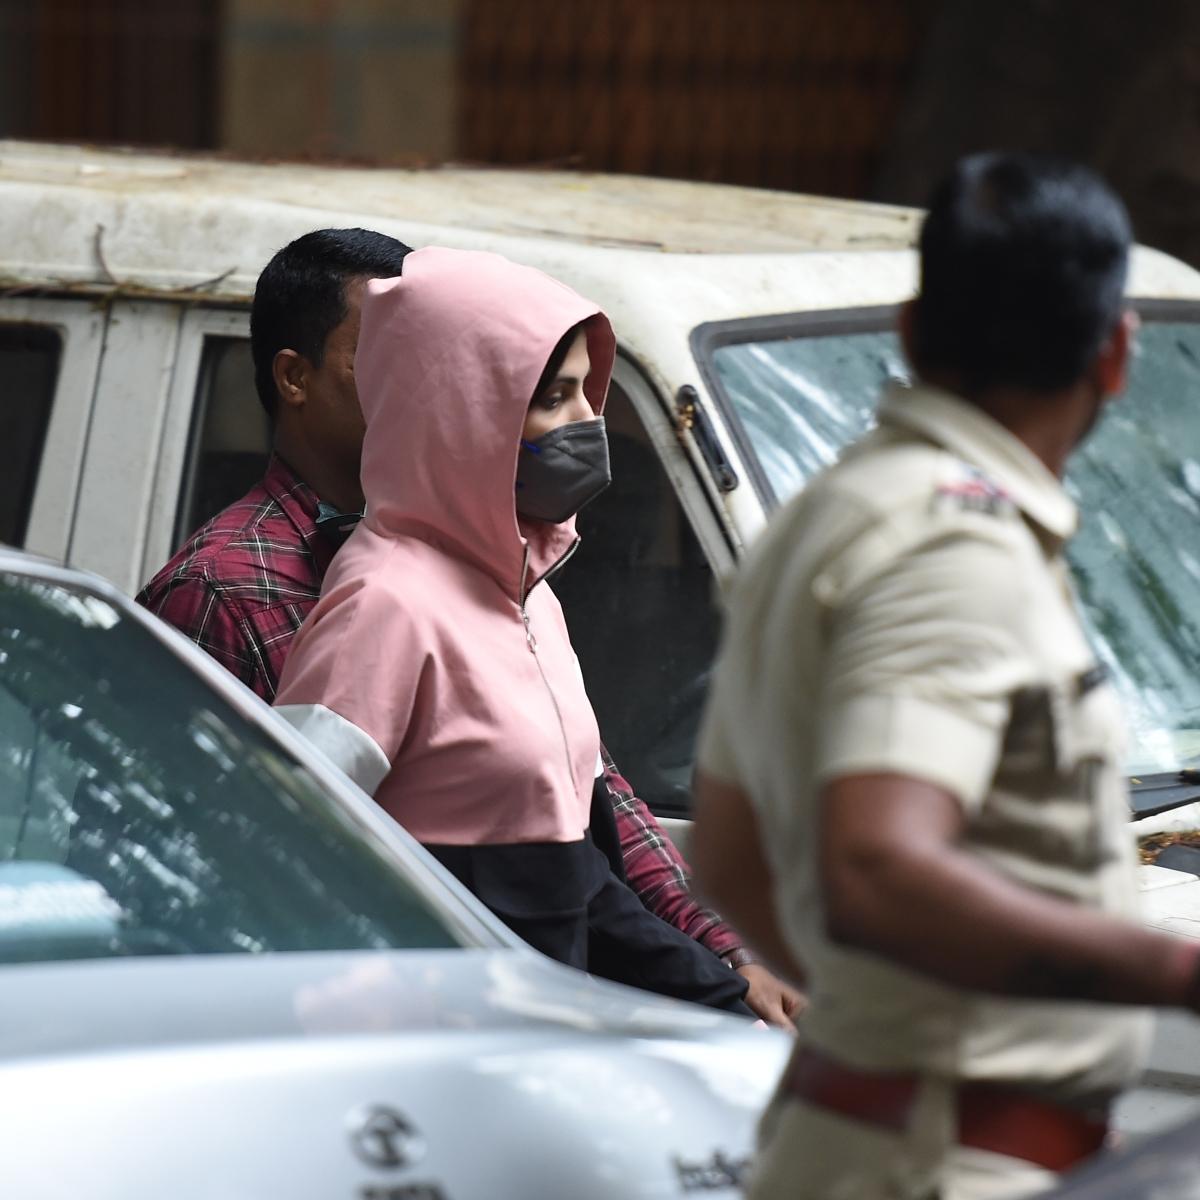 No relief for Rhea Chakraborty: Bombay HC defers bail plea to September 28